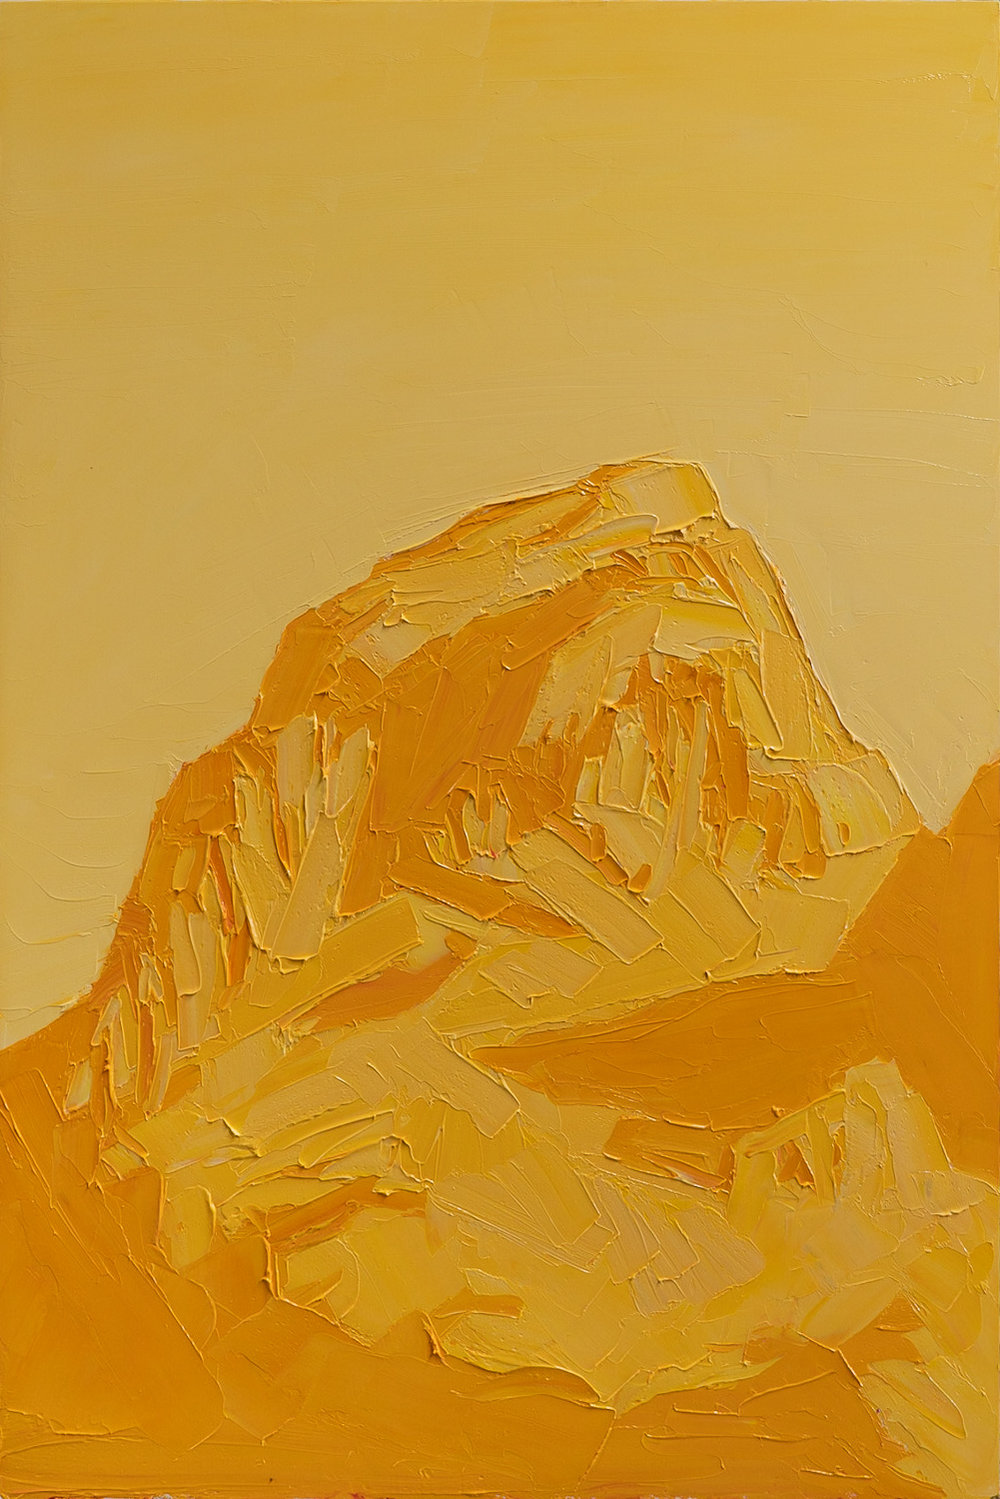 Grand Teton - ROYGBIV - Yellow